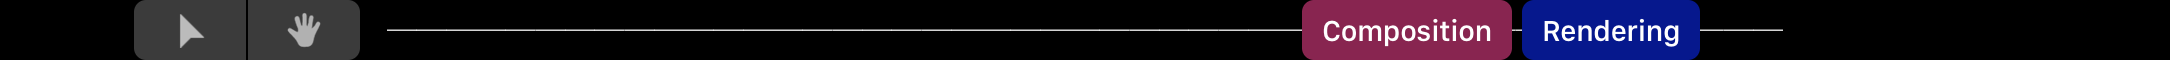 Touch Bar Shot 2019-06-06 at 12.34.35.png